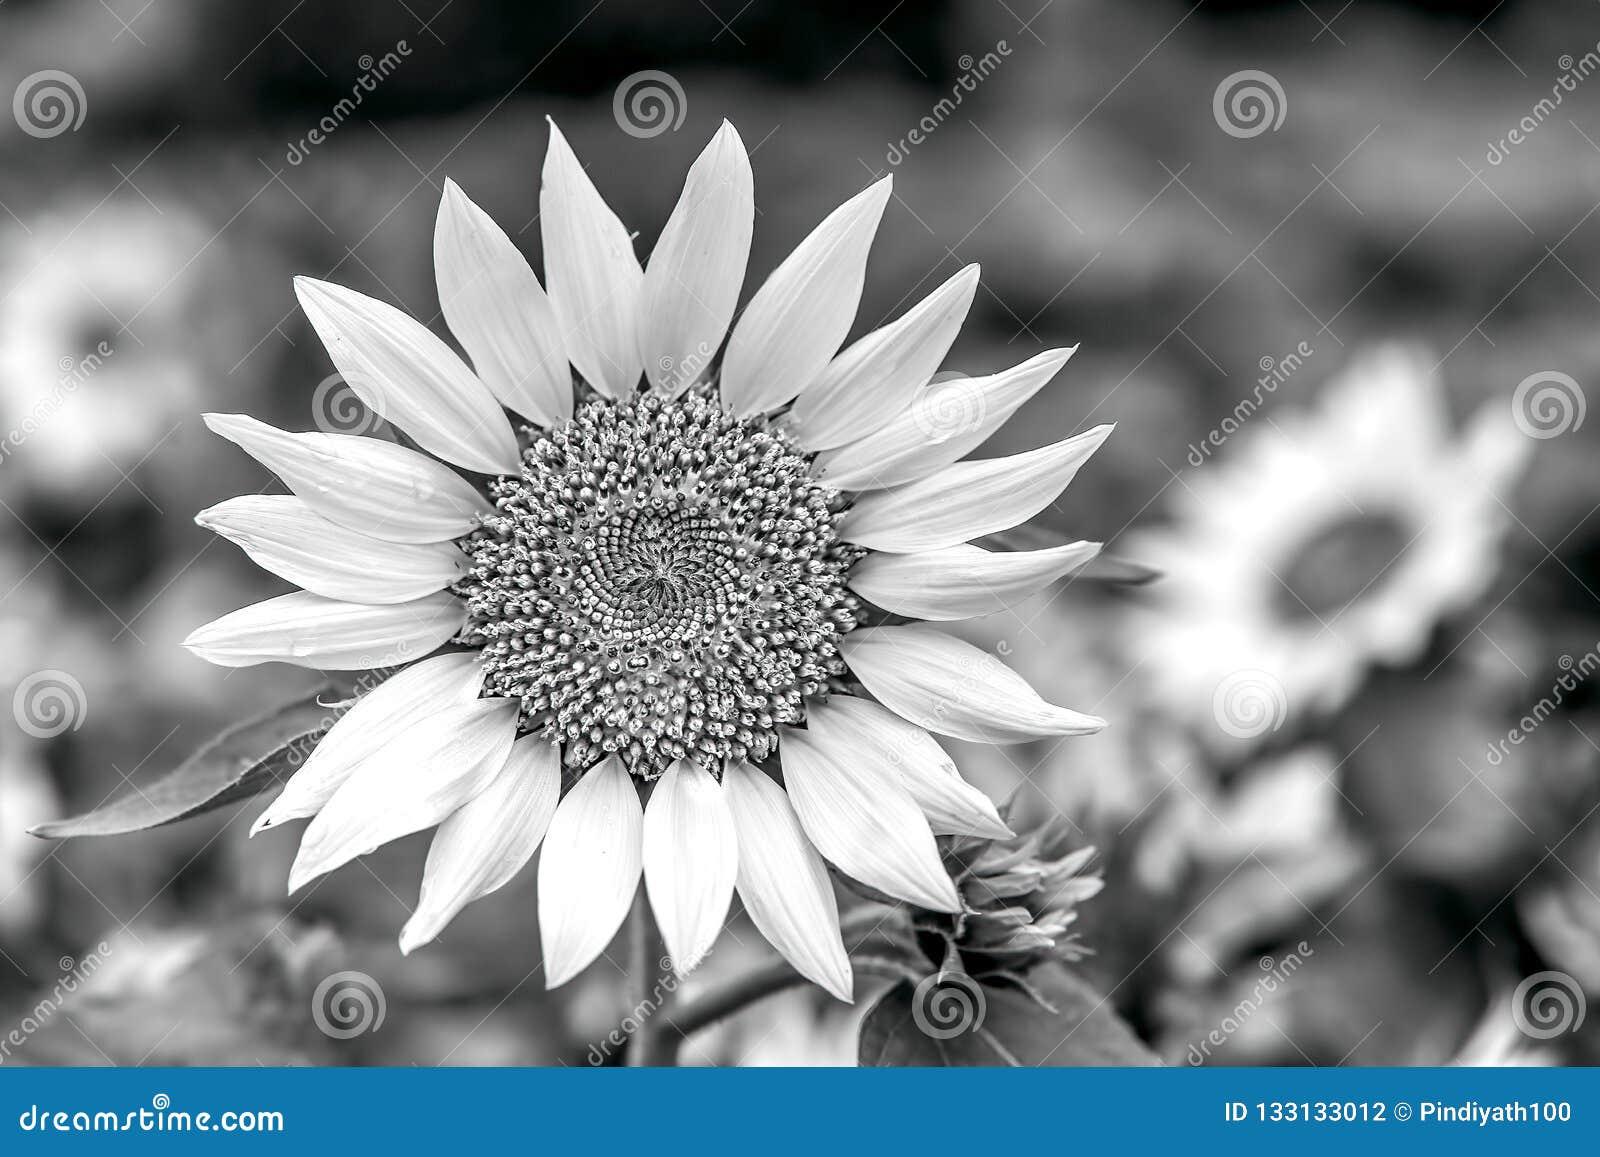 Cheerful sunflower on a sunny day